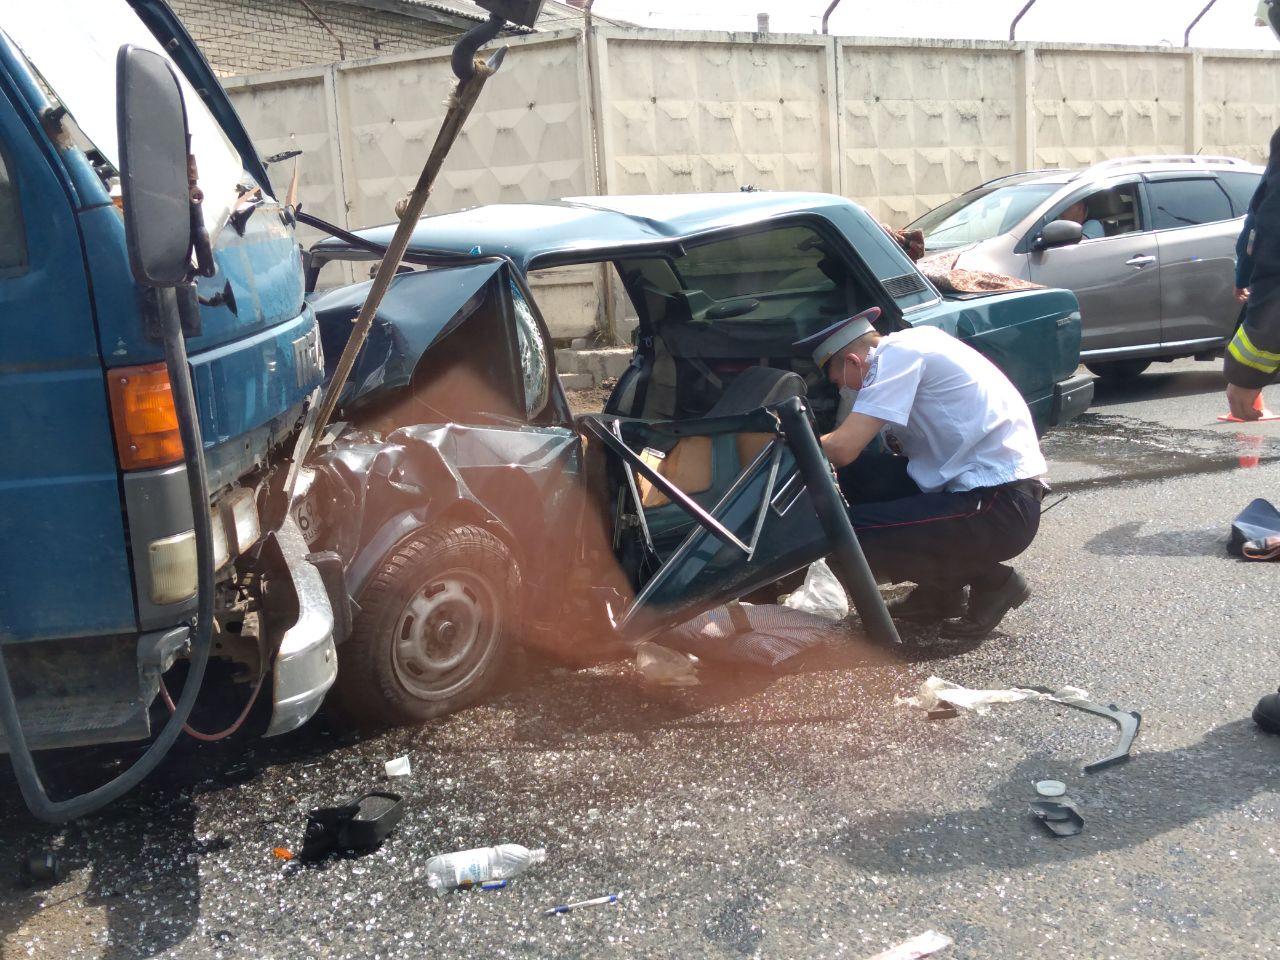 В Твери водителя «семерки» зажало в салоне после столкновения с грузовиком - новости Афанасий